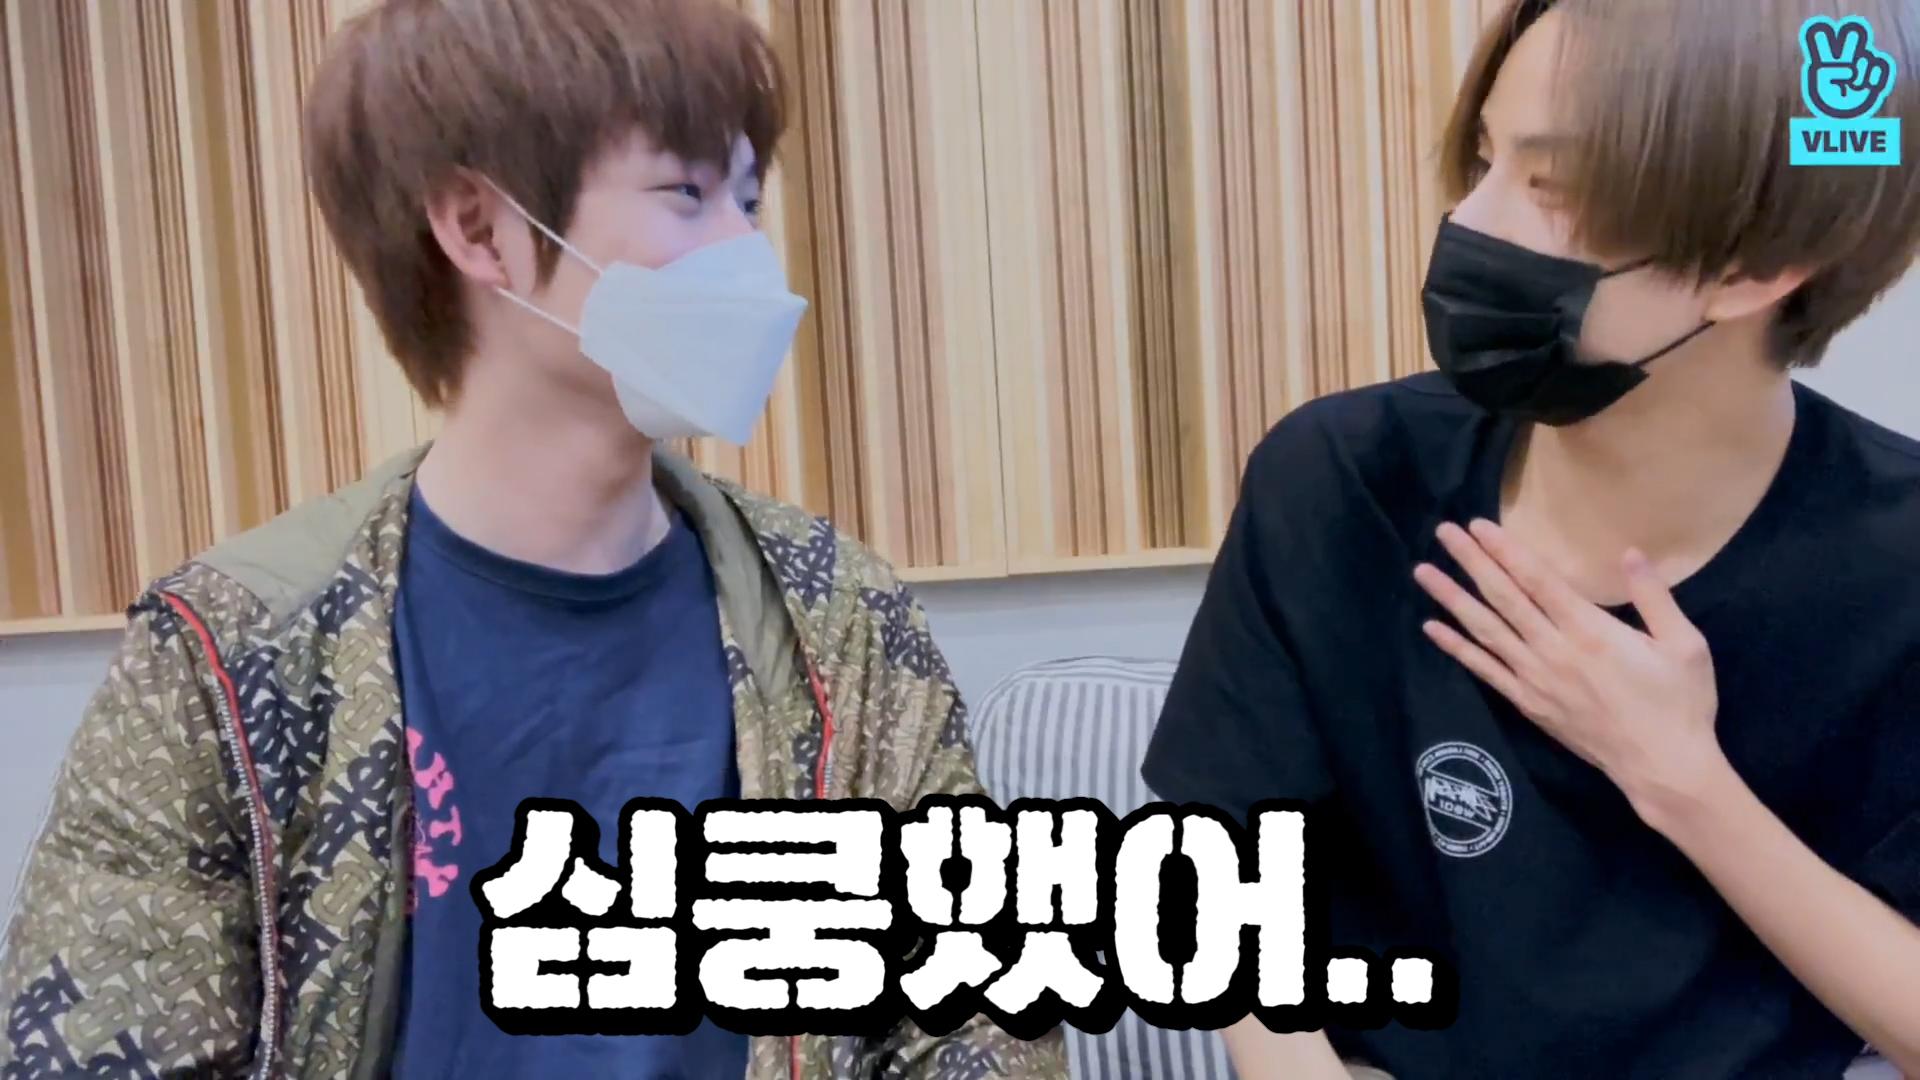 [NCT] 오복이는 심쿵 러러는 아쿵 나는 엔시티한테 인생쿵🗯️💘 (JUNGWOO&CHENLE talking about Awsaz)